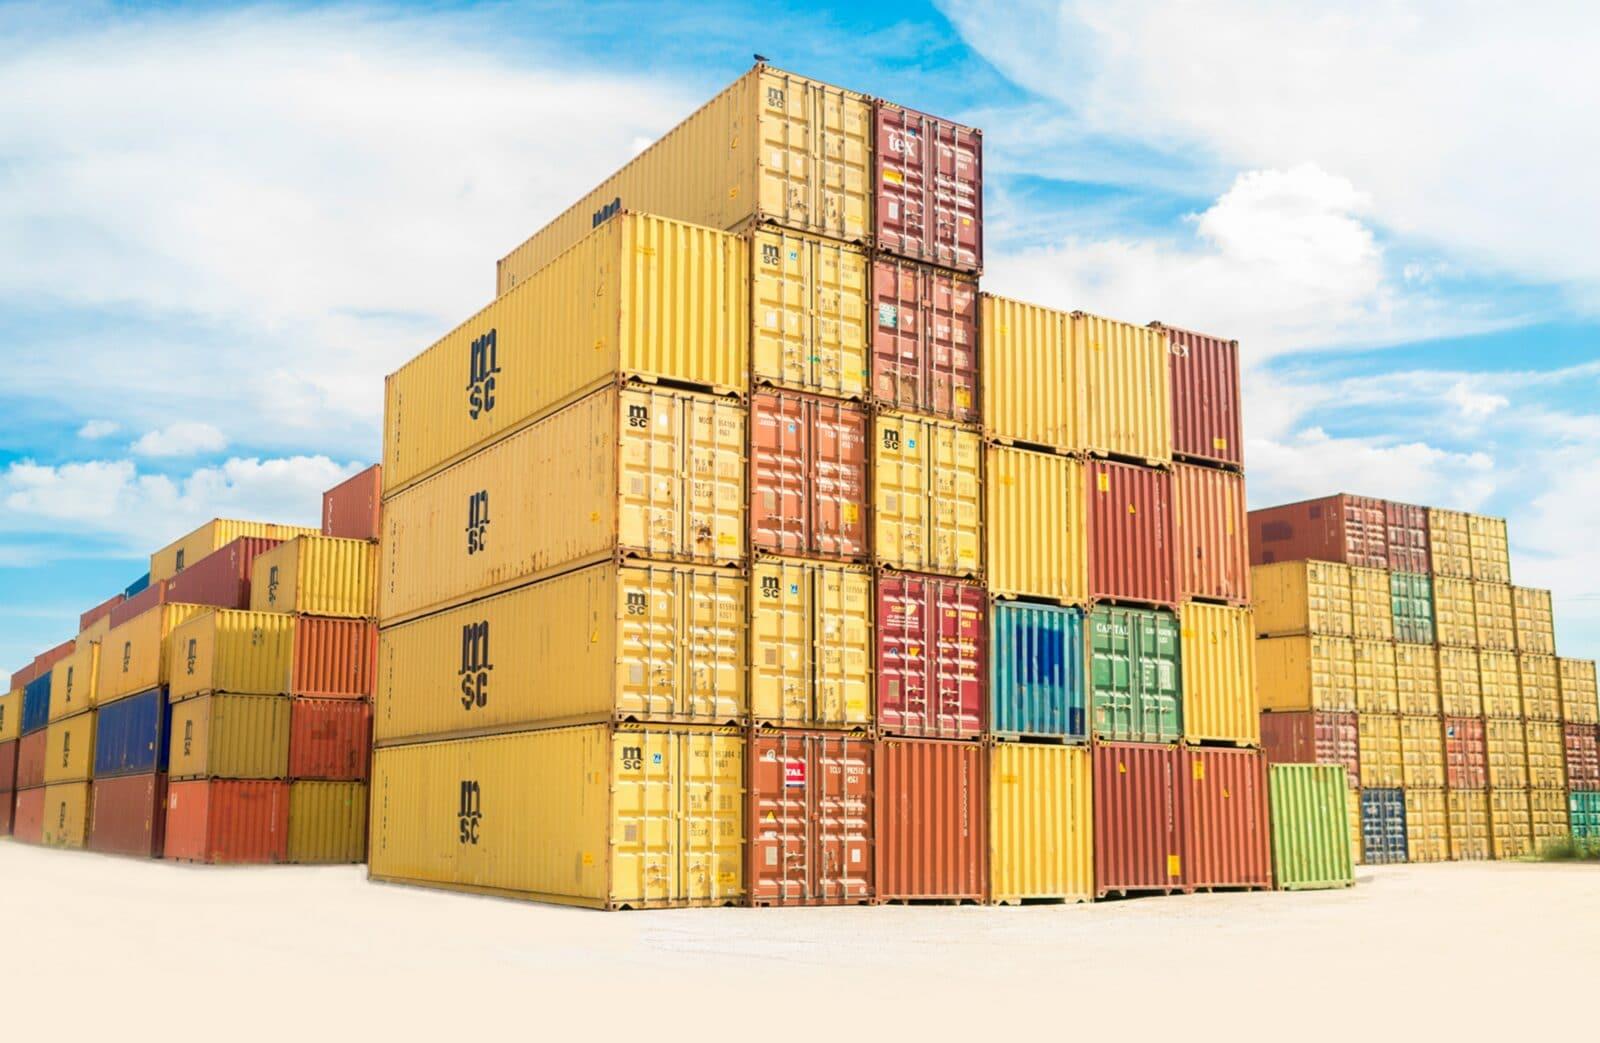 seguro de carga seguro transporte transporte de carga